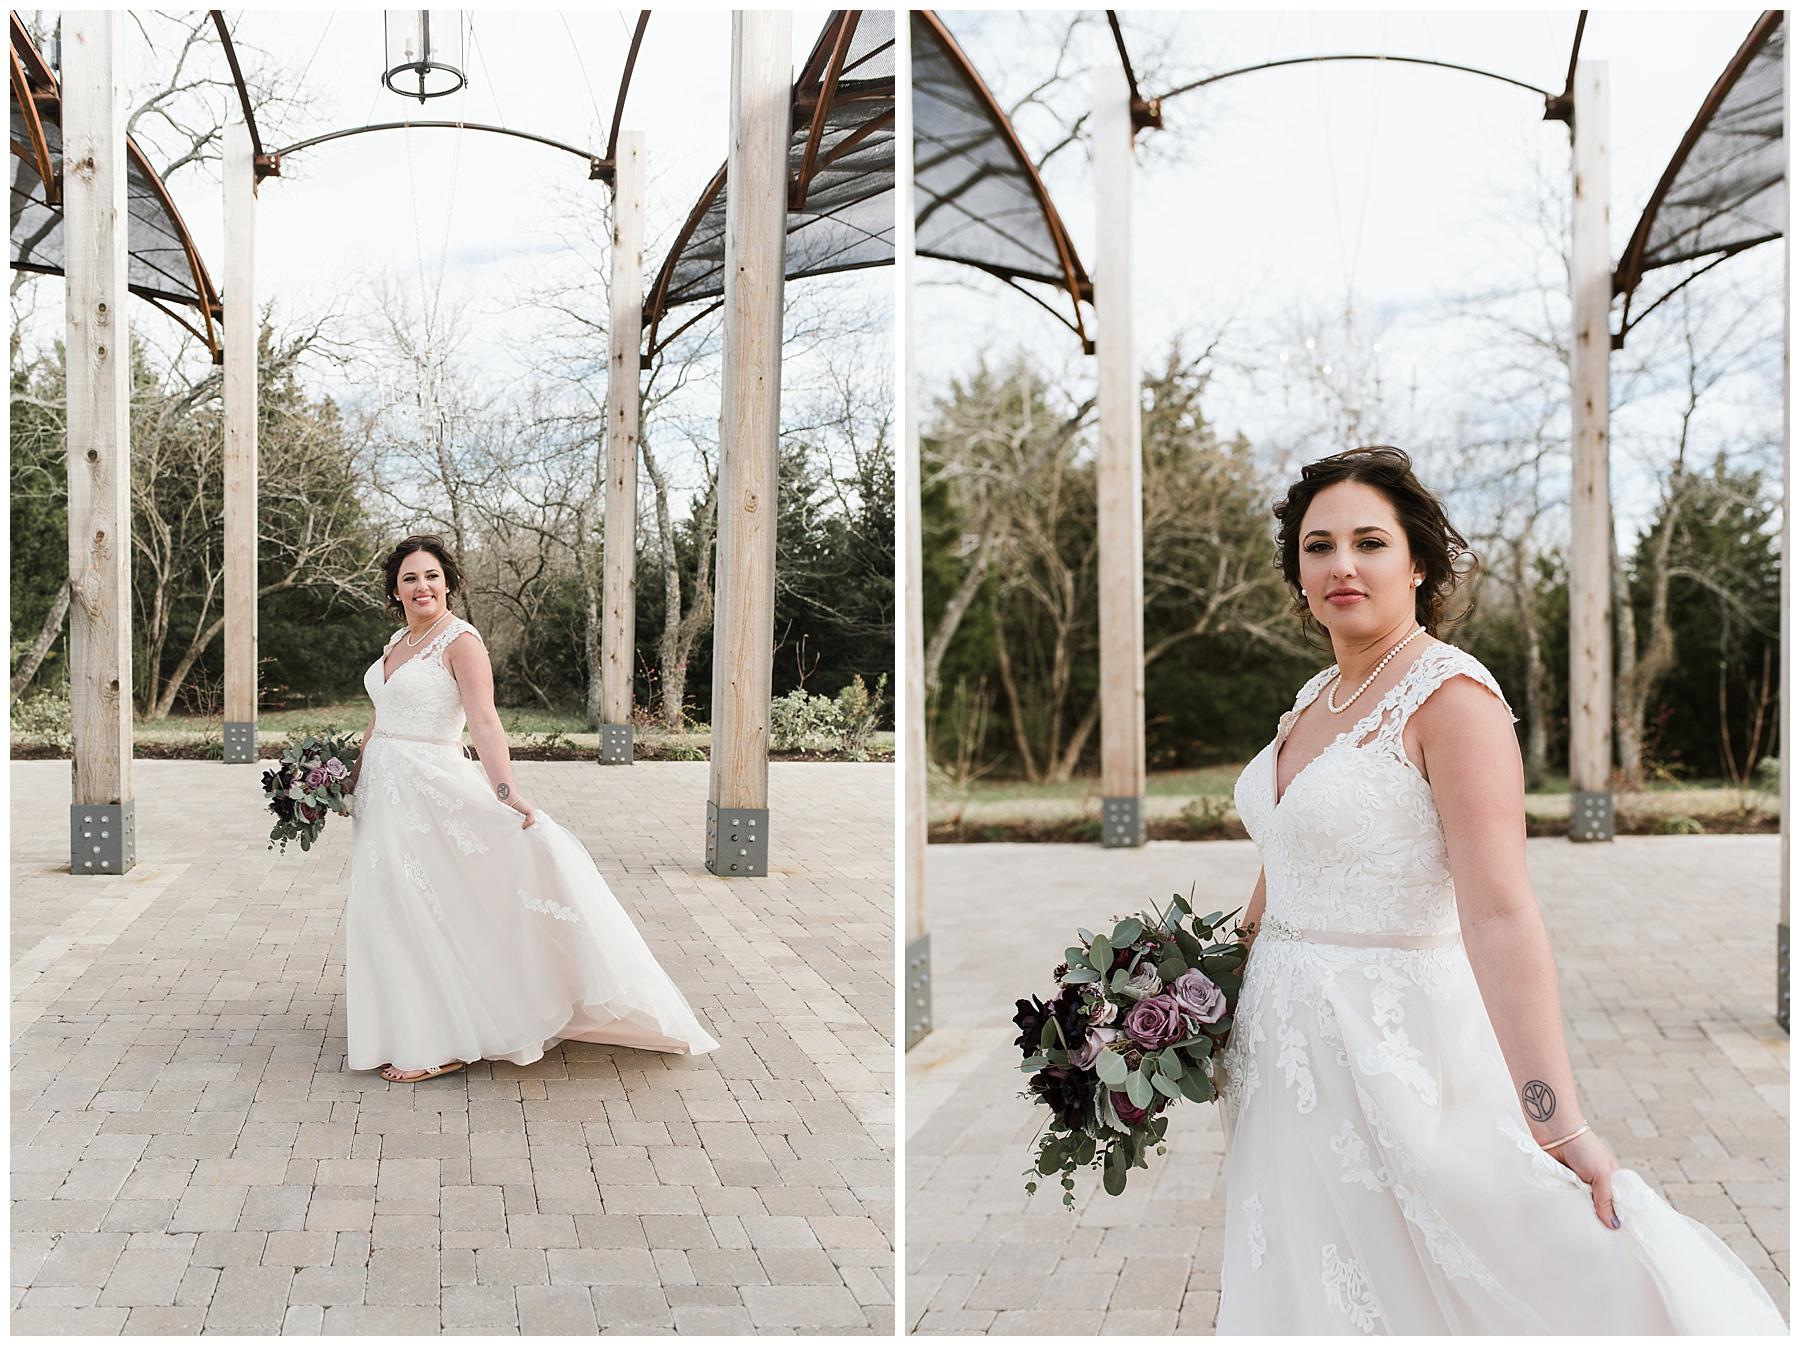 chandlers-garden-celina-wedding-amber-stephen-16.jpg